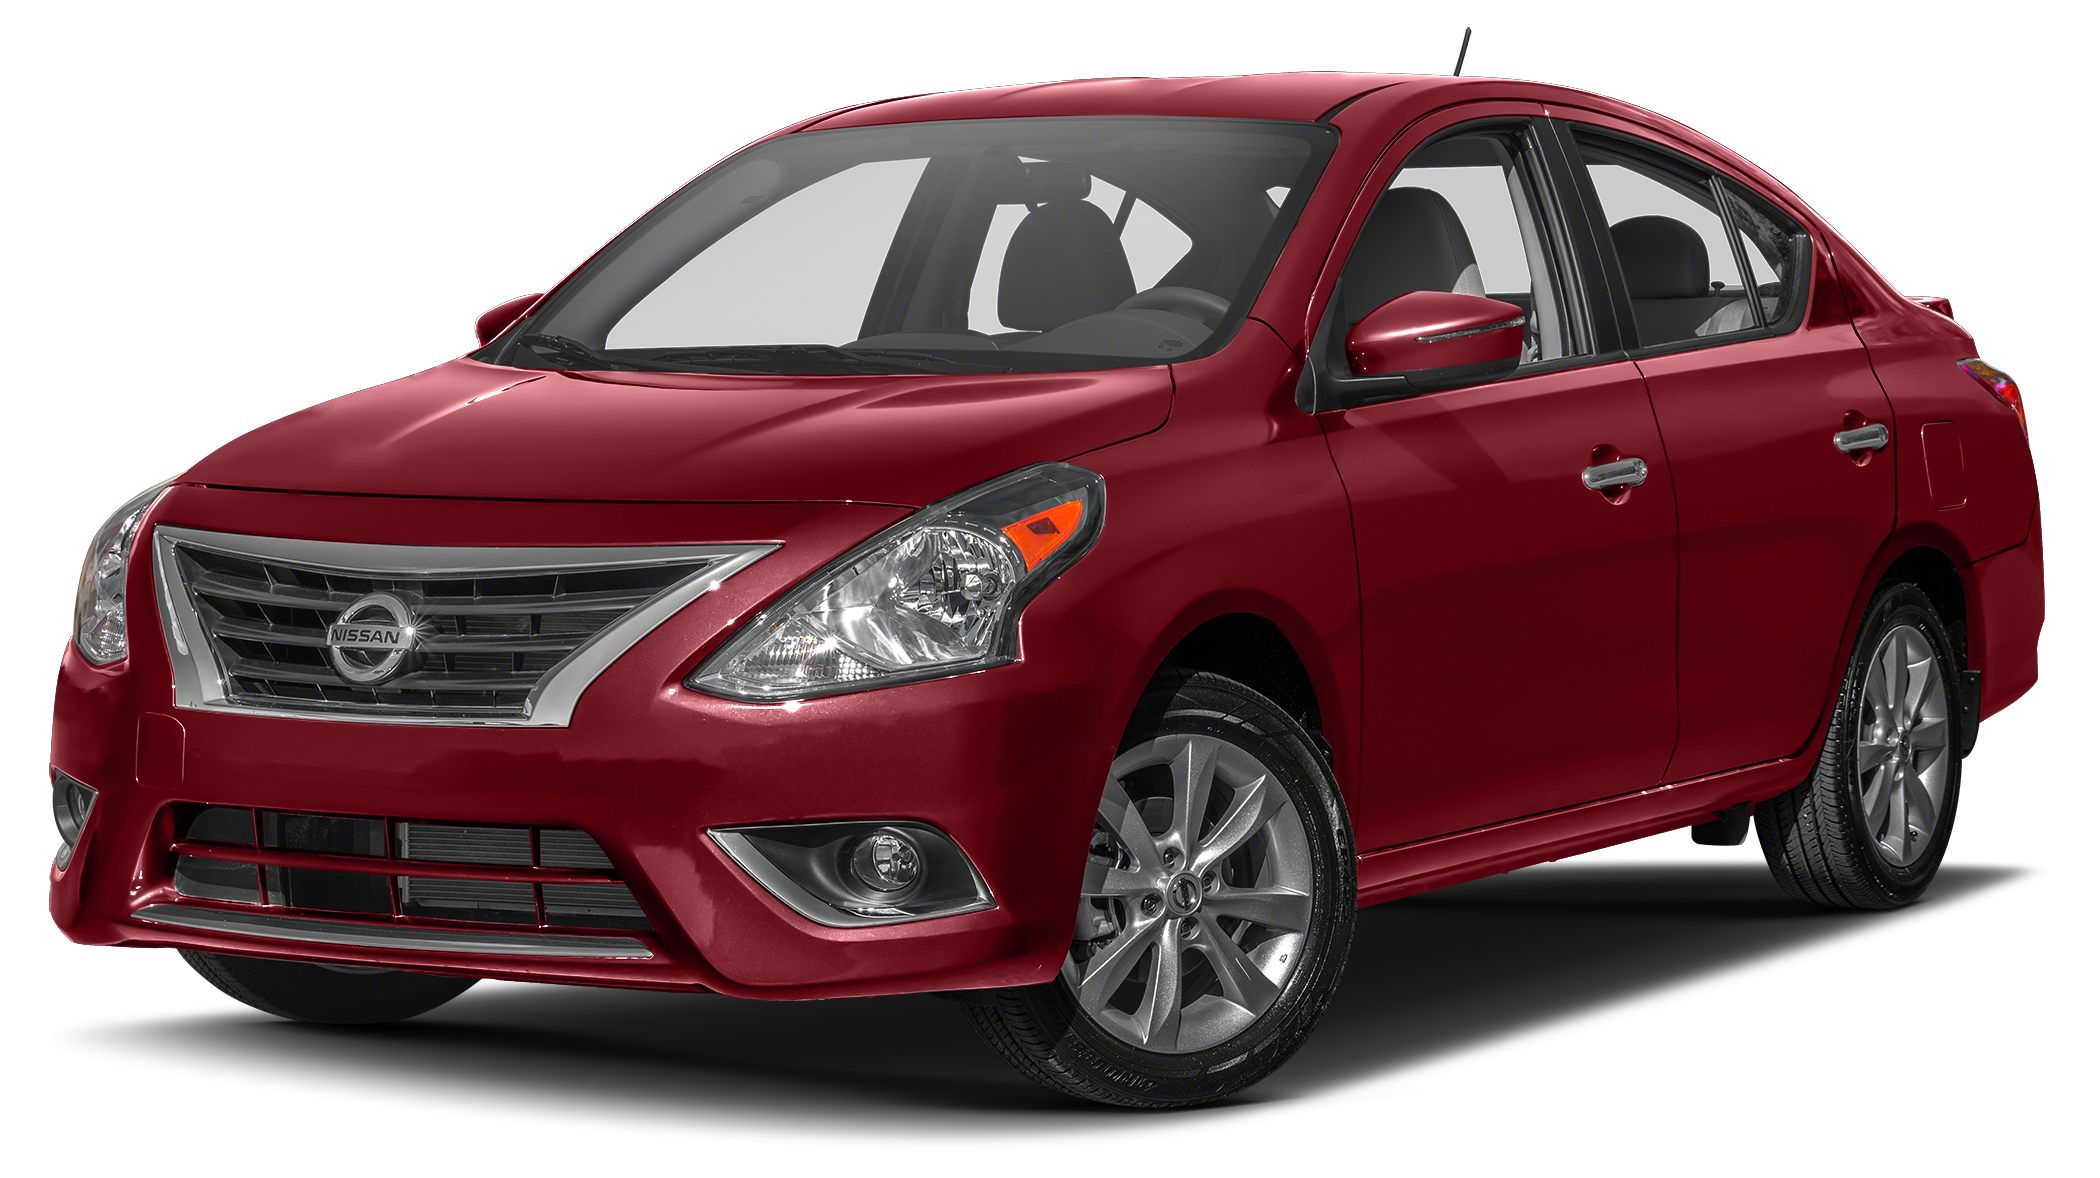 2017 Nissan Versa 16 SL Miles 3Color Cayenne Red Stock 7170020 VIN 3N1CN7AP8HL802087